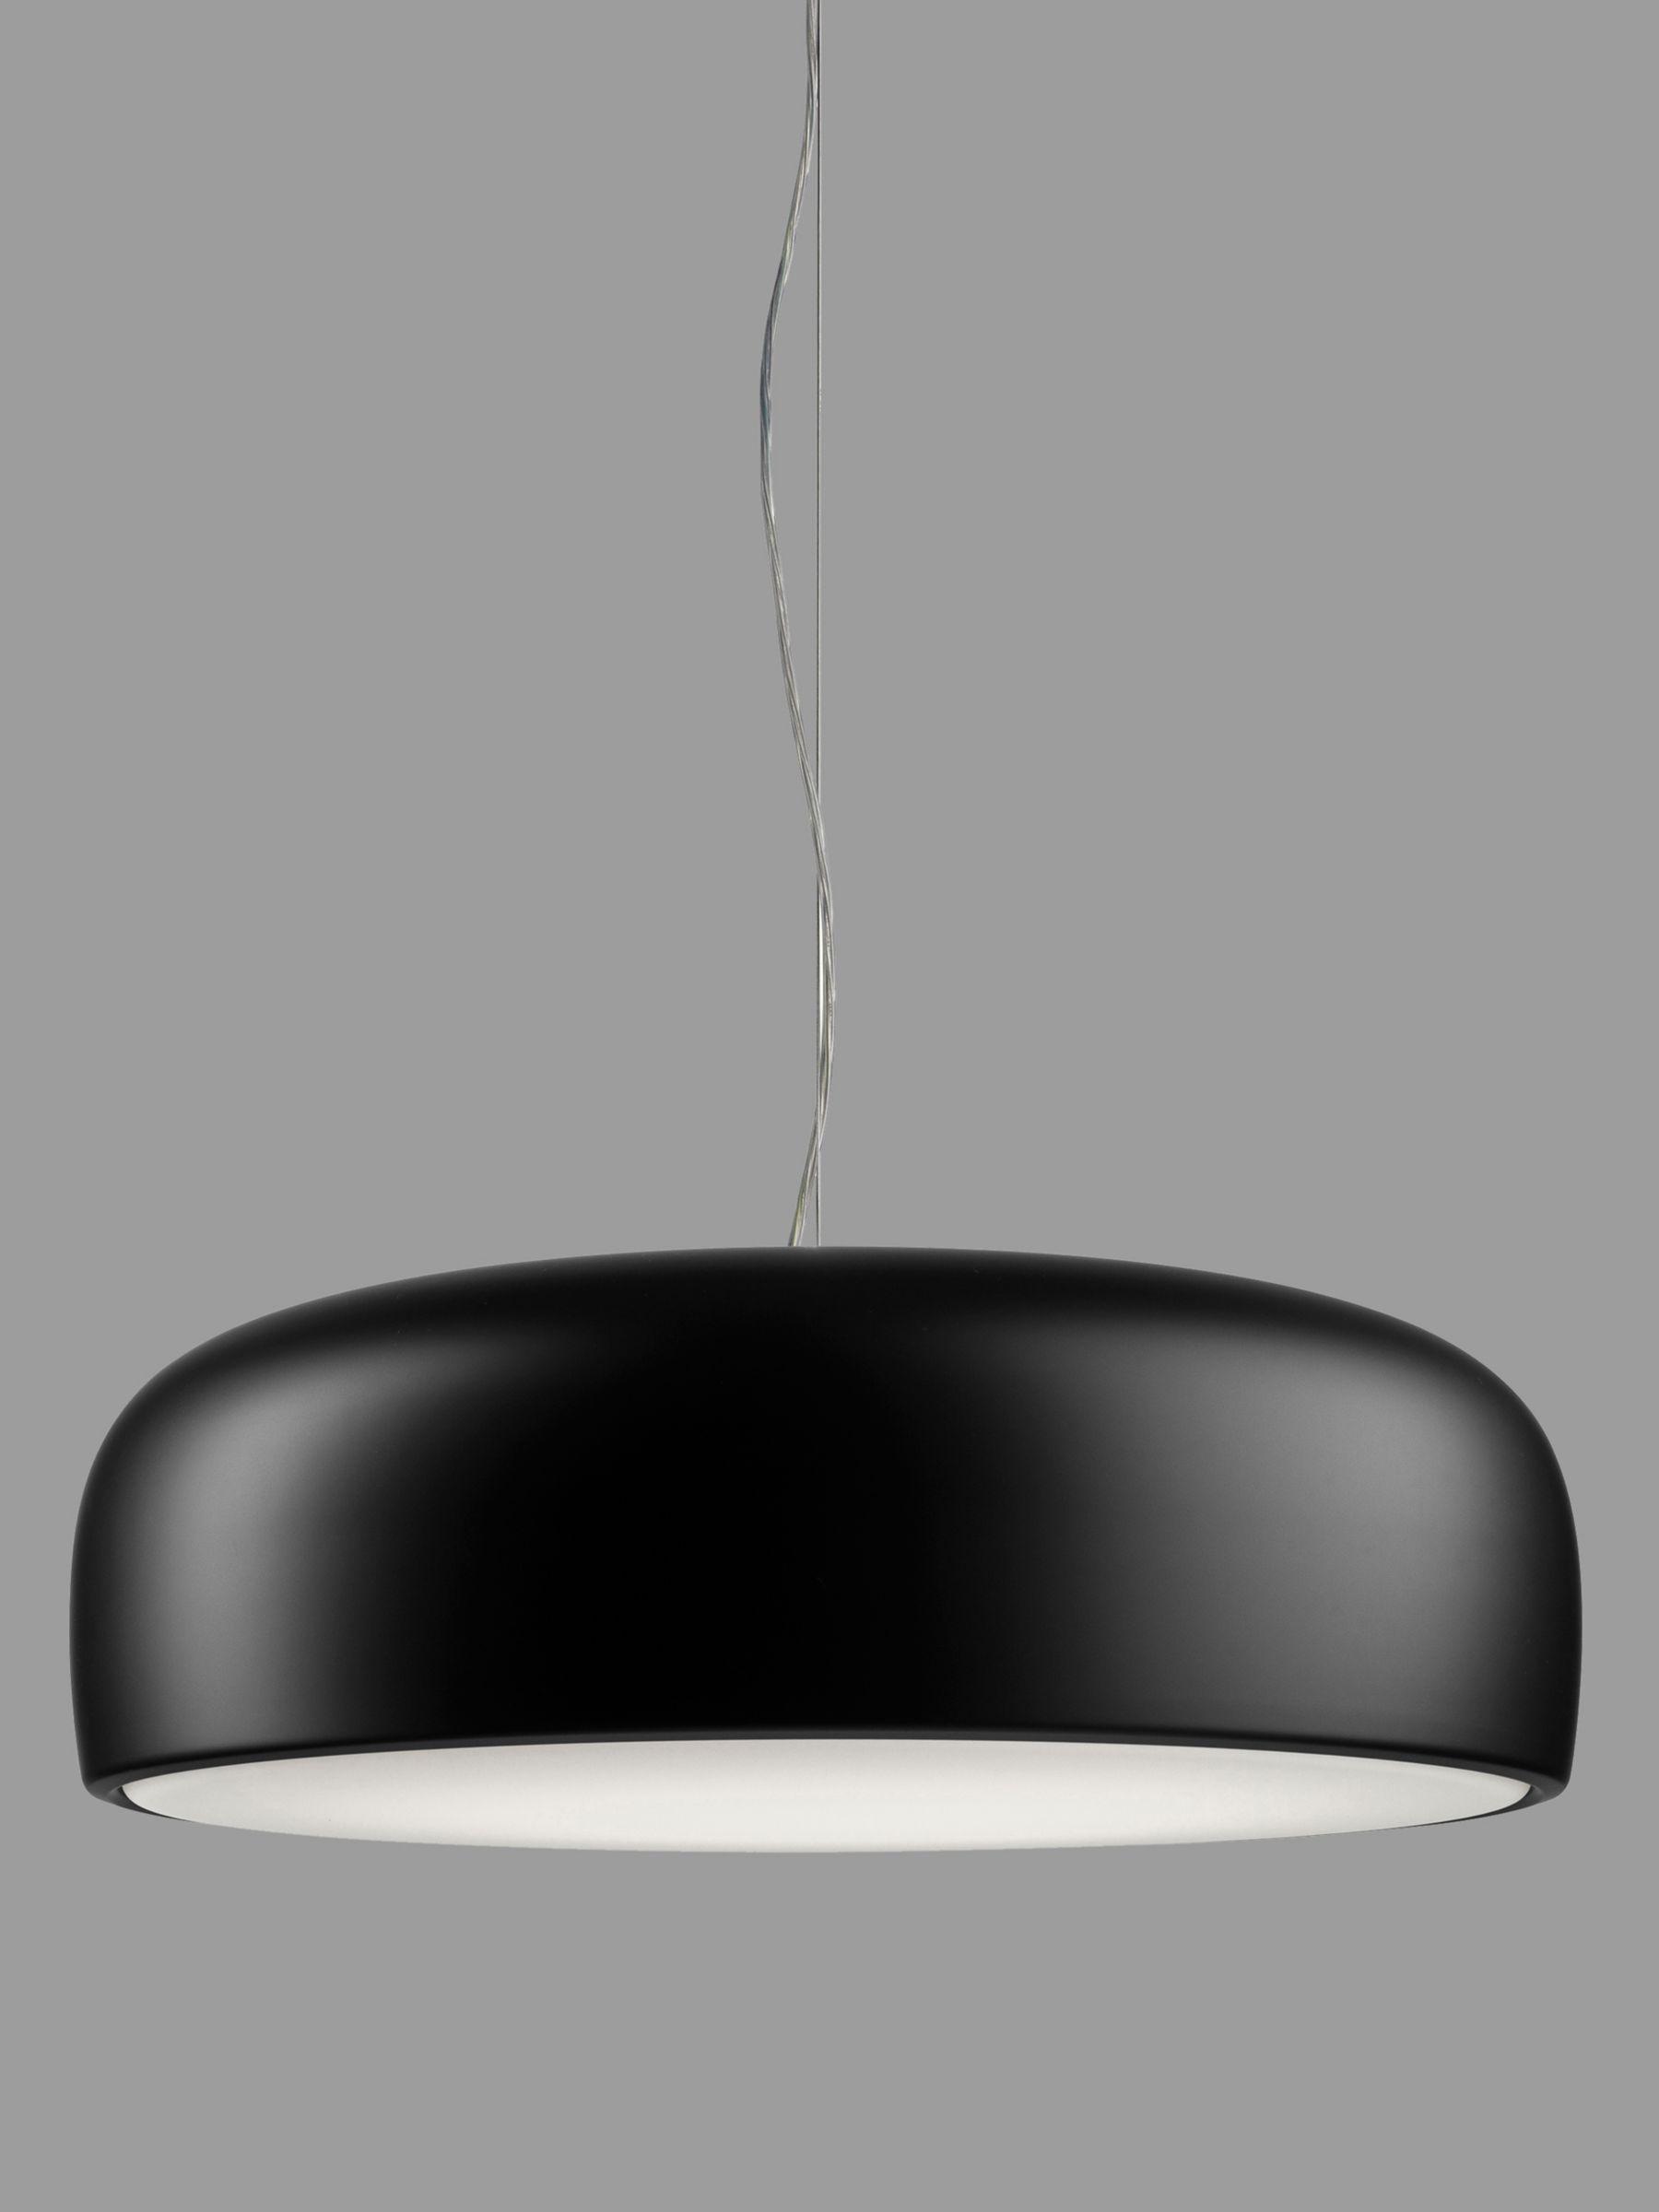 Flos Flos Smithfield Suspension Ceiling Light, Glossy Black